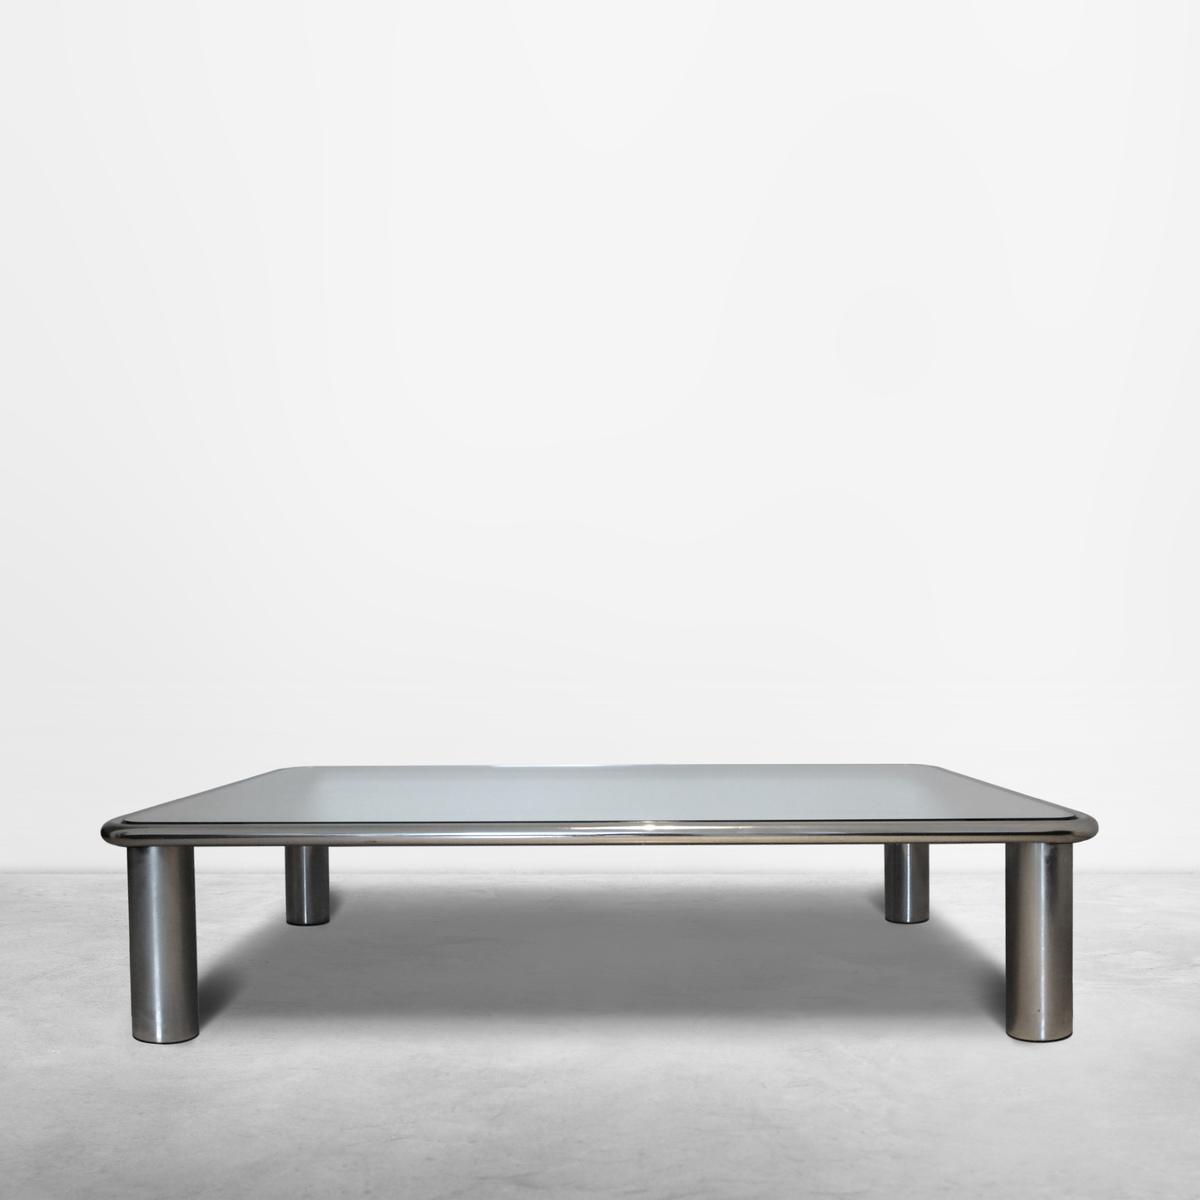 "Gianfranco Frattini for Cassina, Italian Mid-Century ""Sesann"" Coffee Table in chromed metal and mirror top, 1968"